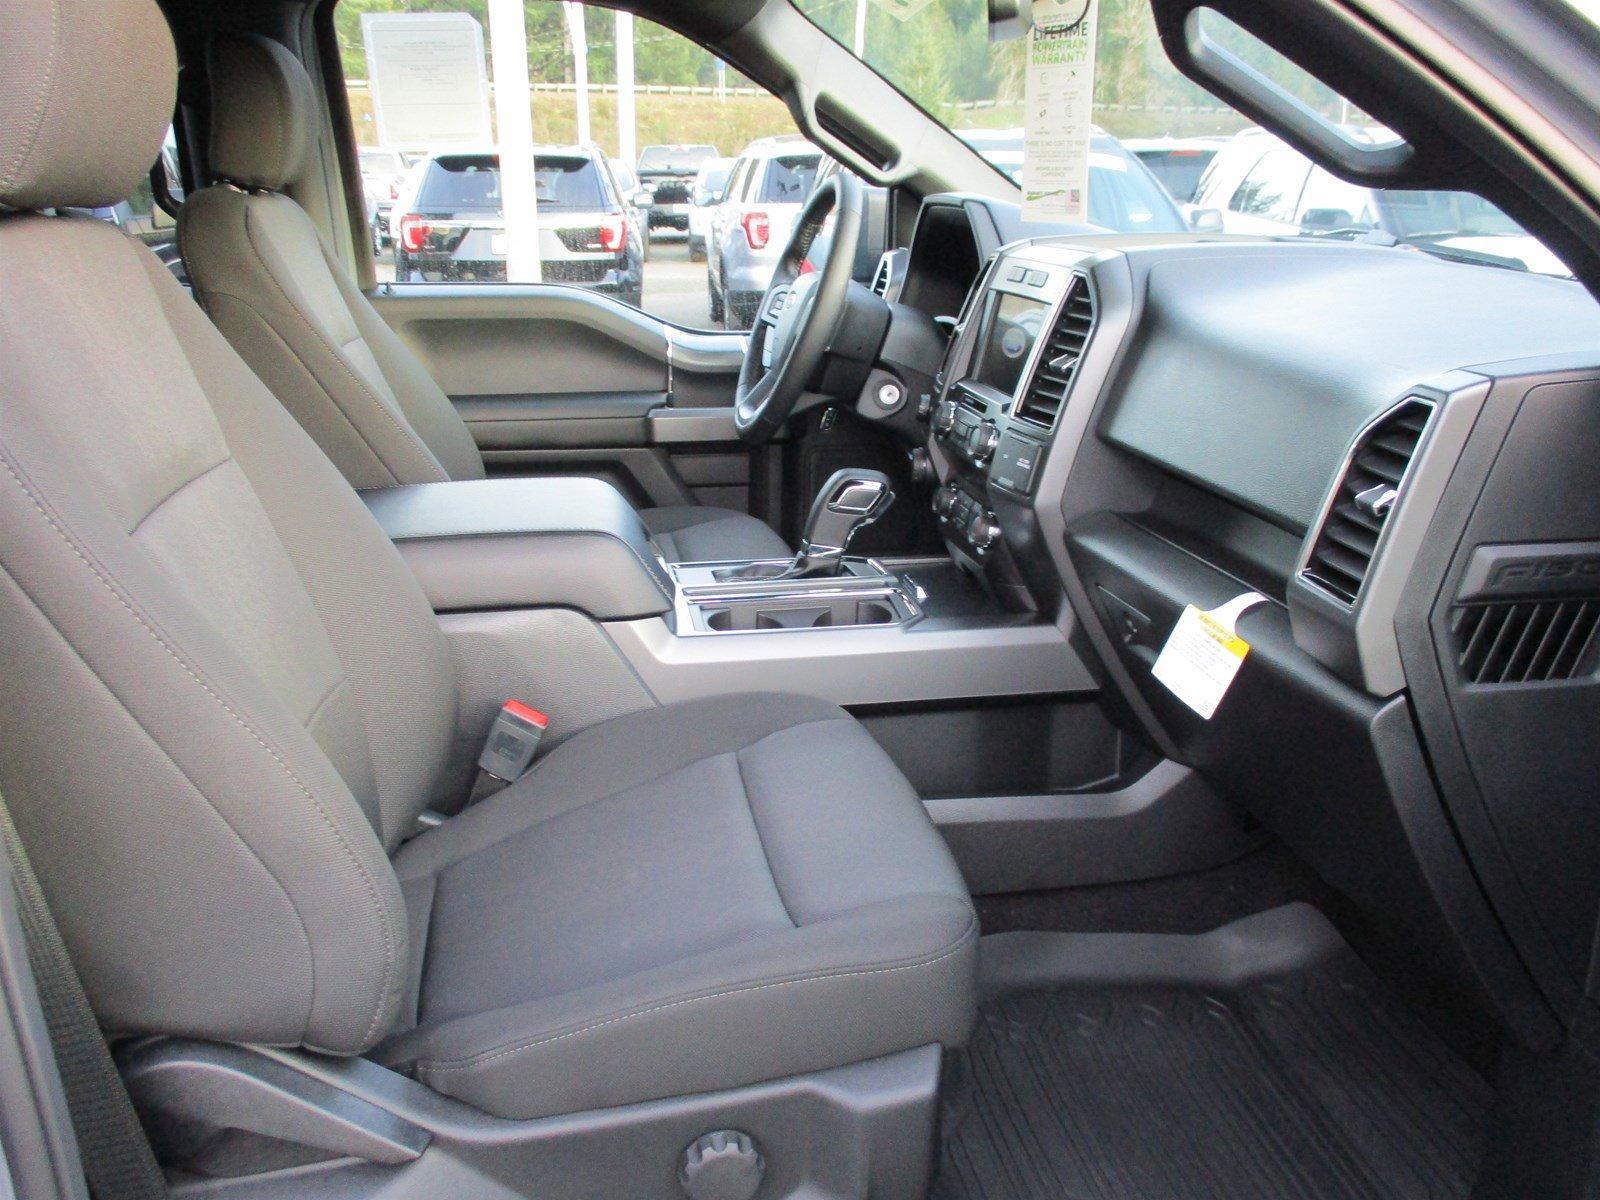 New 2019 Ford F-150 XLT 4WD SuperCrew 5.5' Box